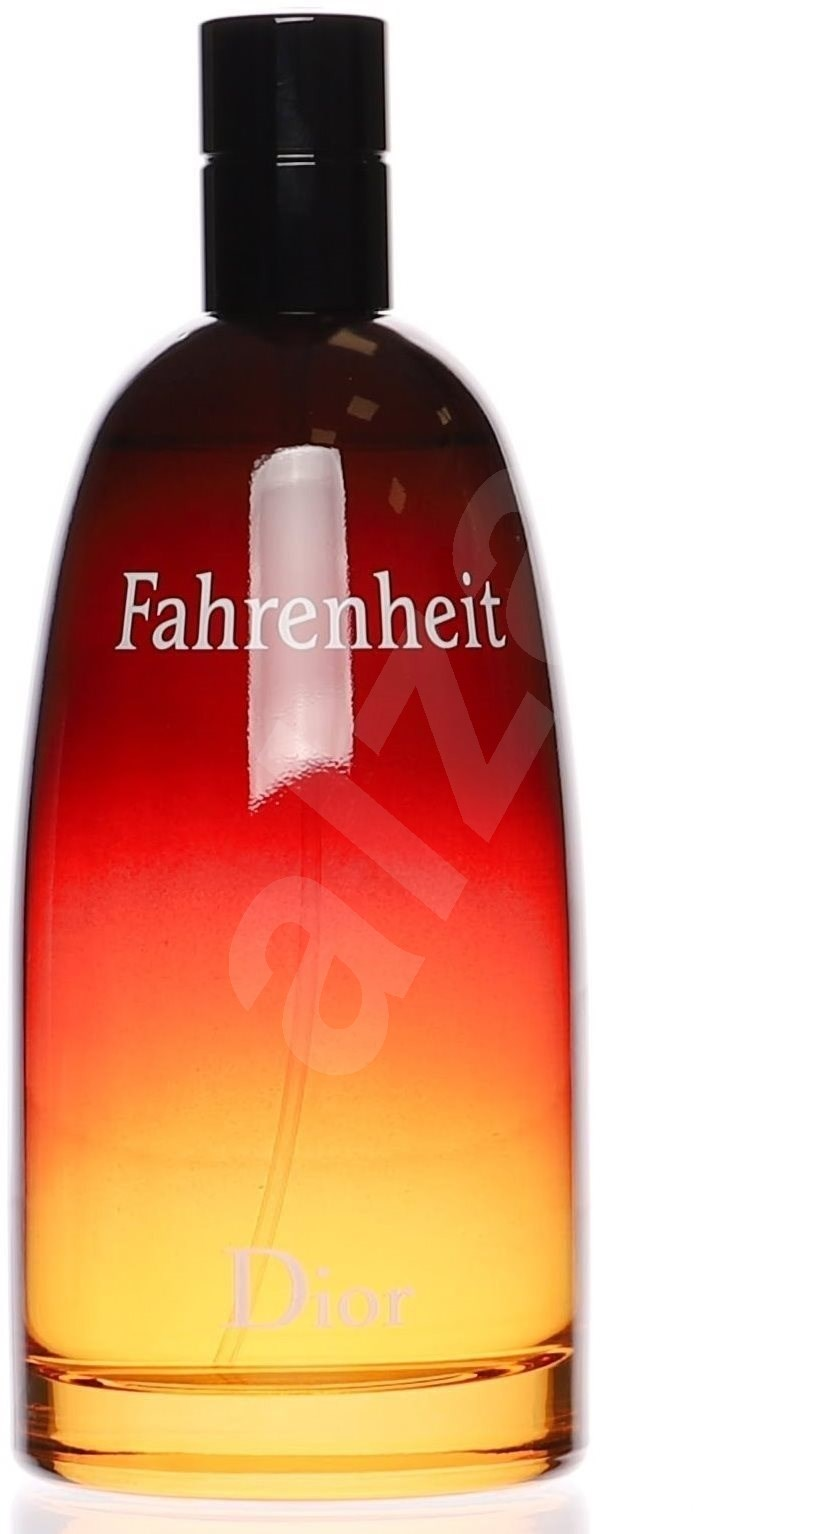 Dior Fahrenheit Cologne Avis | Mount Mercy University